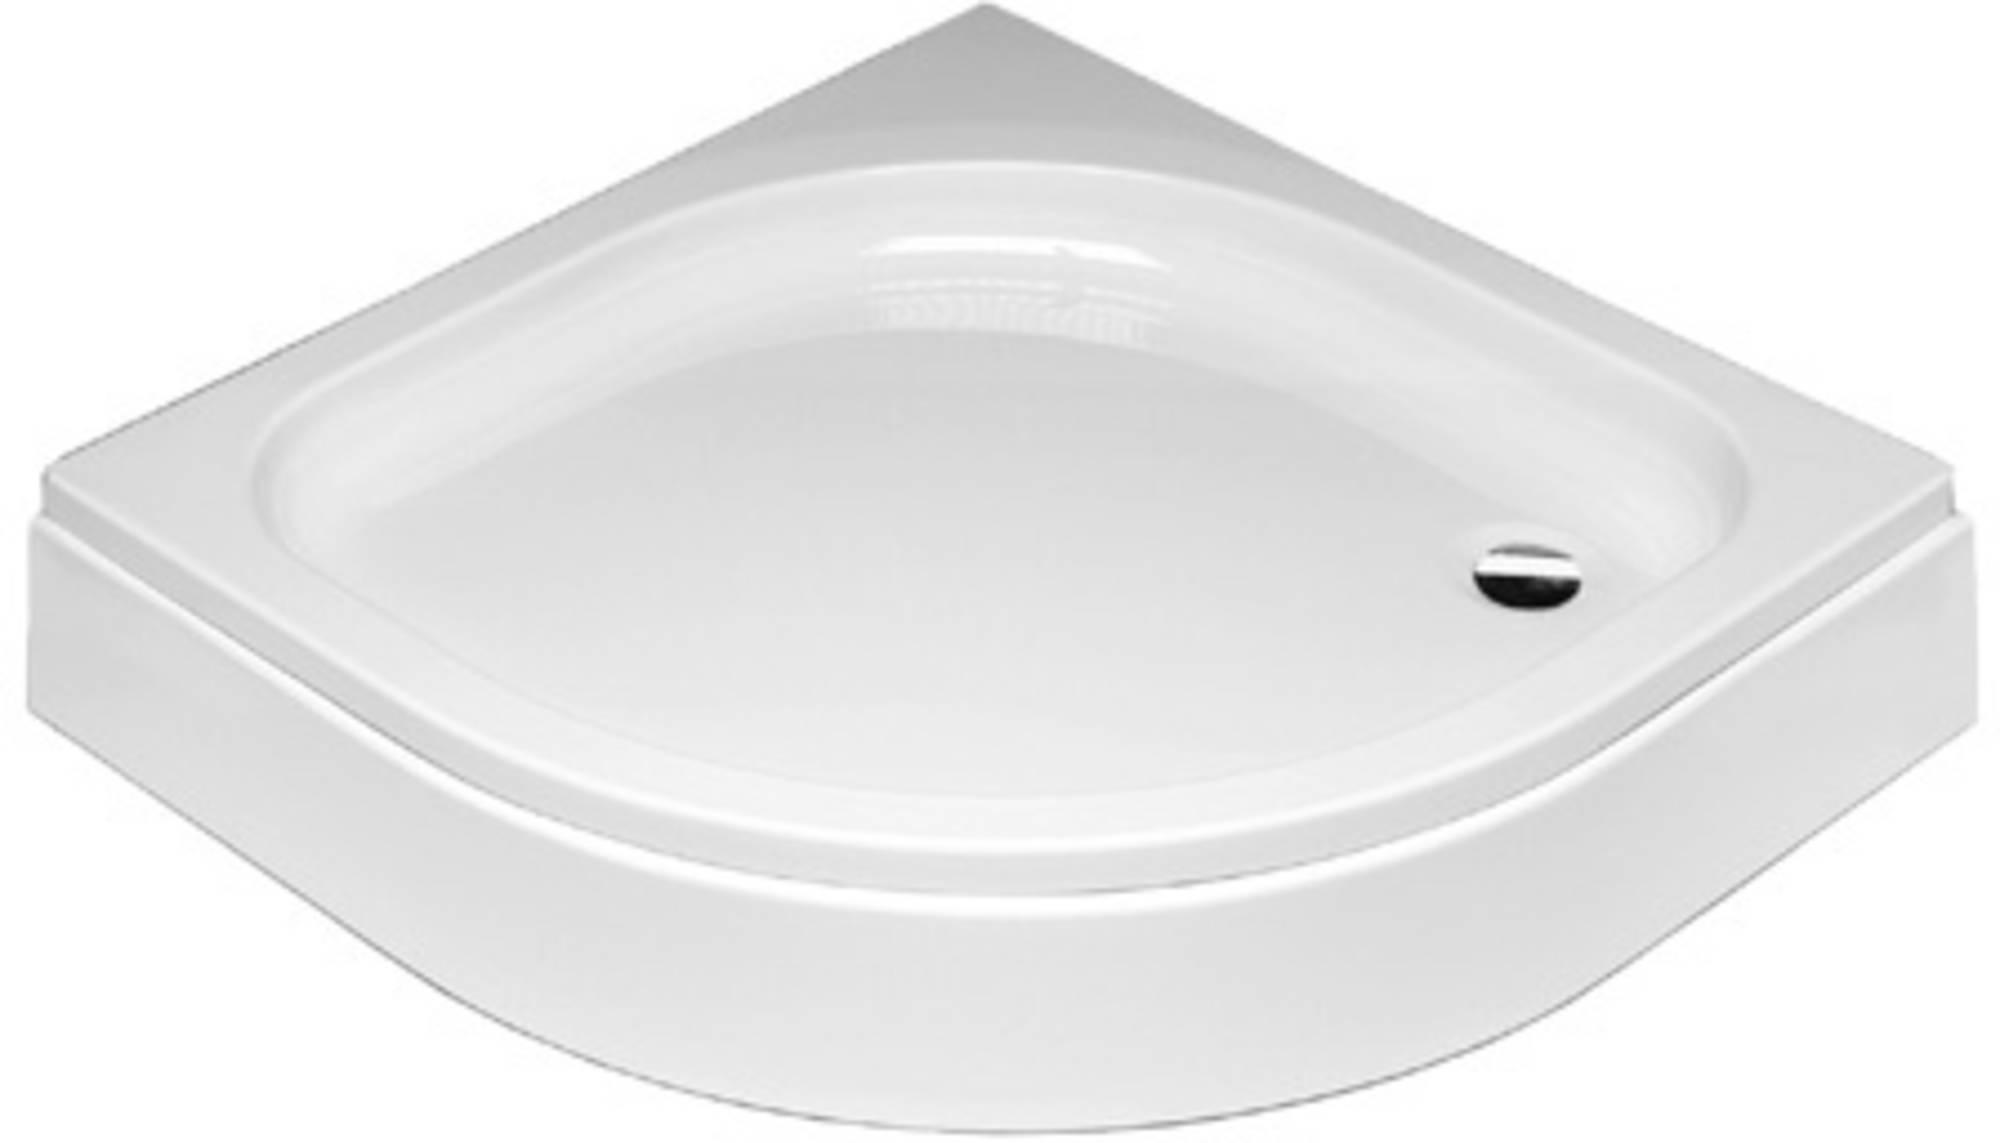 Sealskin Comfort douchebak kwartrond 90x90 cm opbouw wit